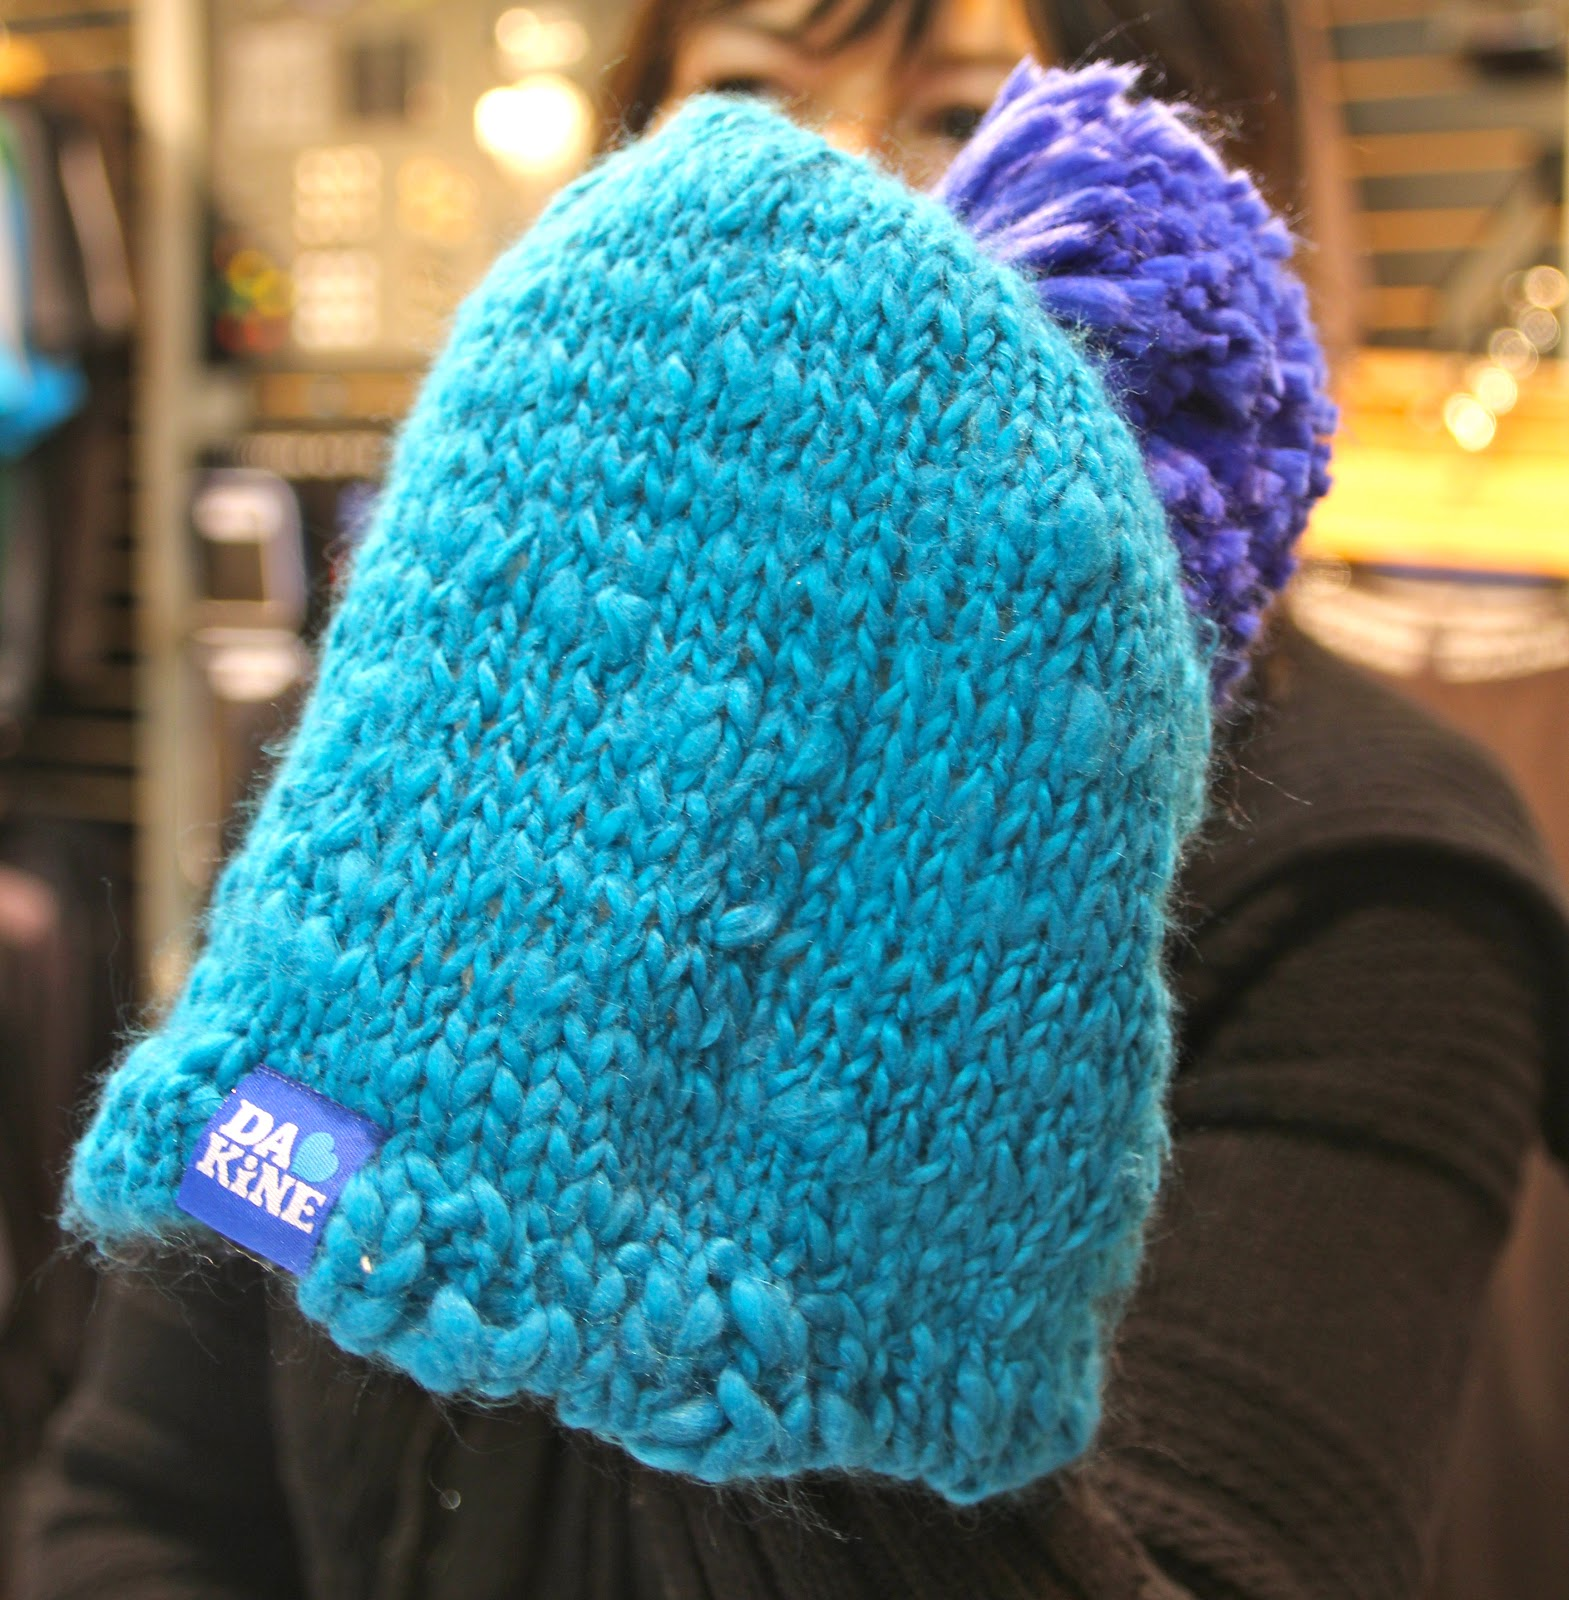 284446a0589 DAKINE FALL 2012 Performance Packs Gloves Hats Apparel Fall 2012